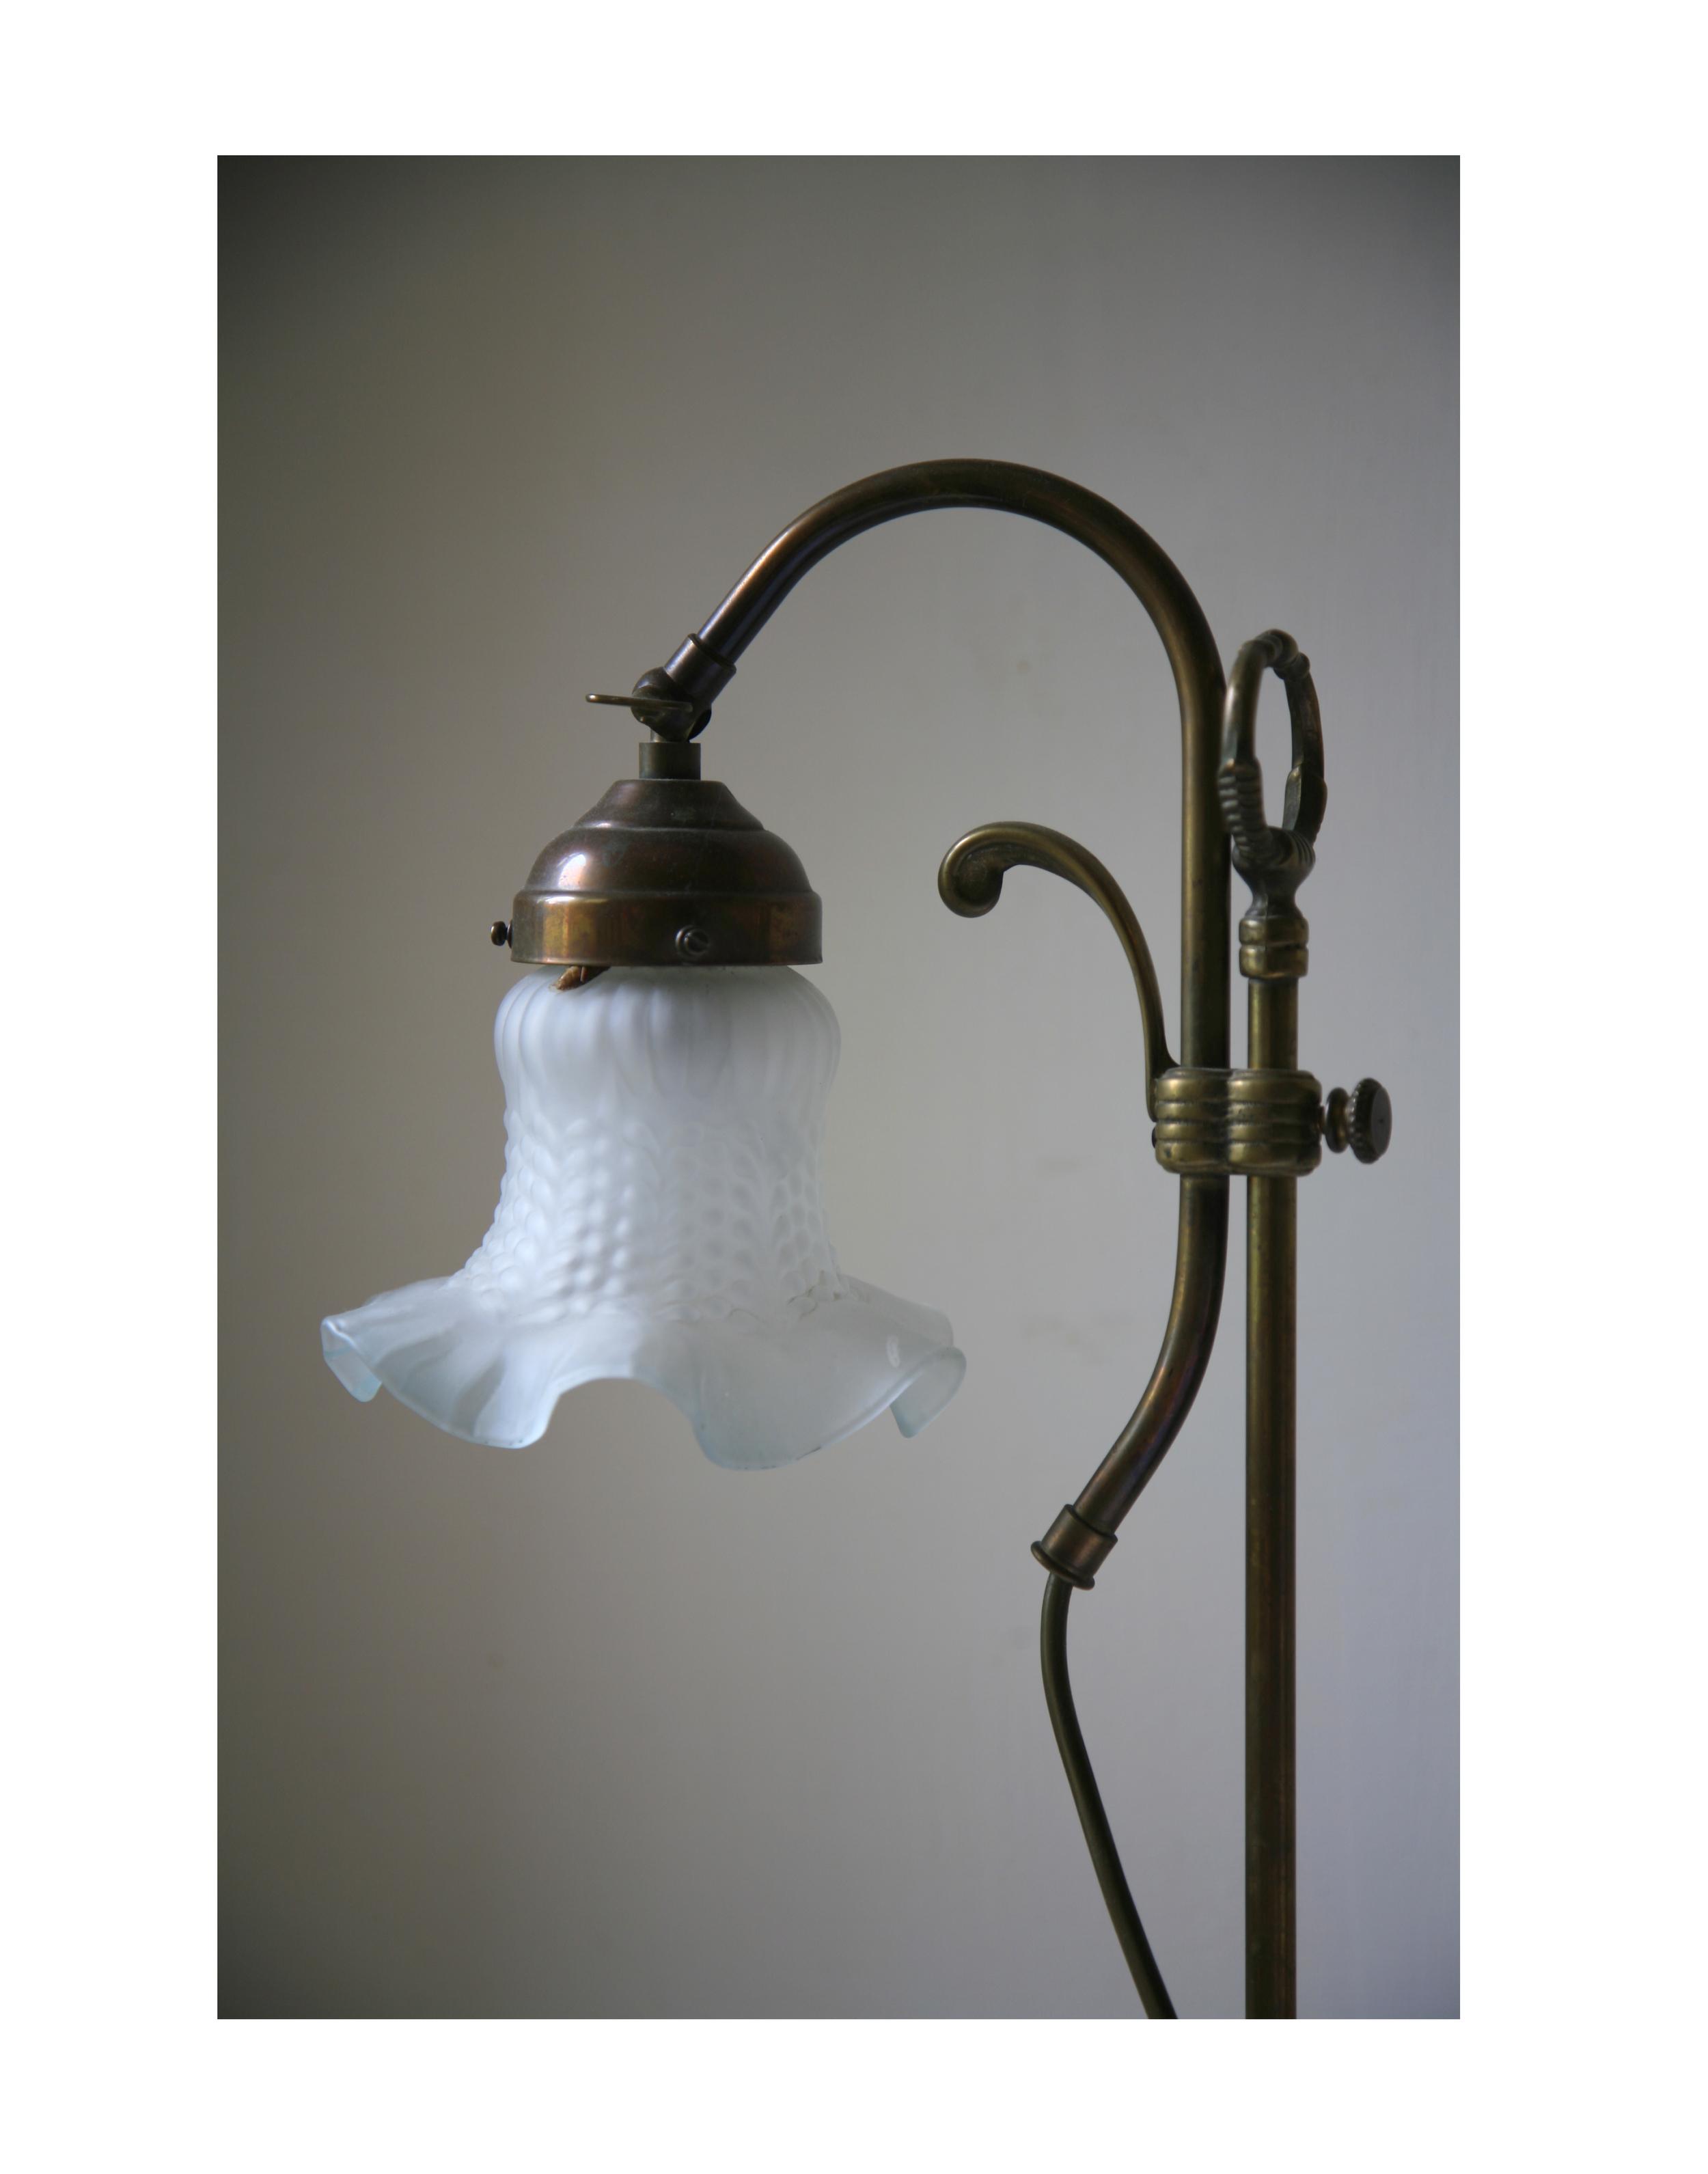 Chateaux Leboulin Lamp.jpg